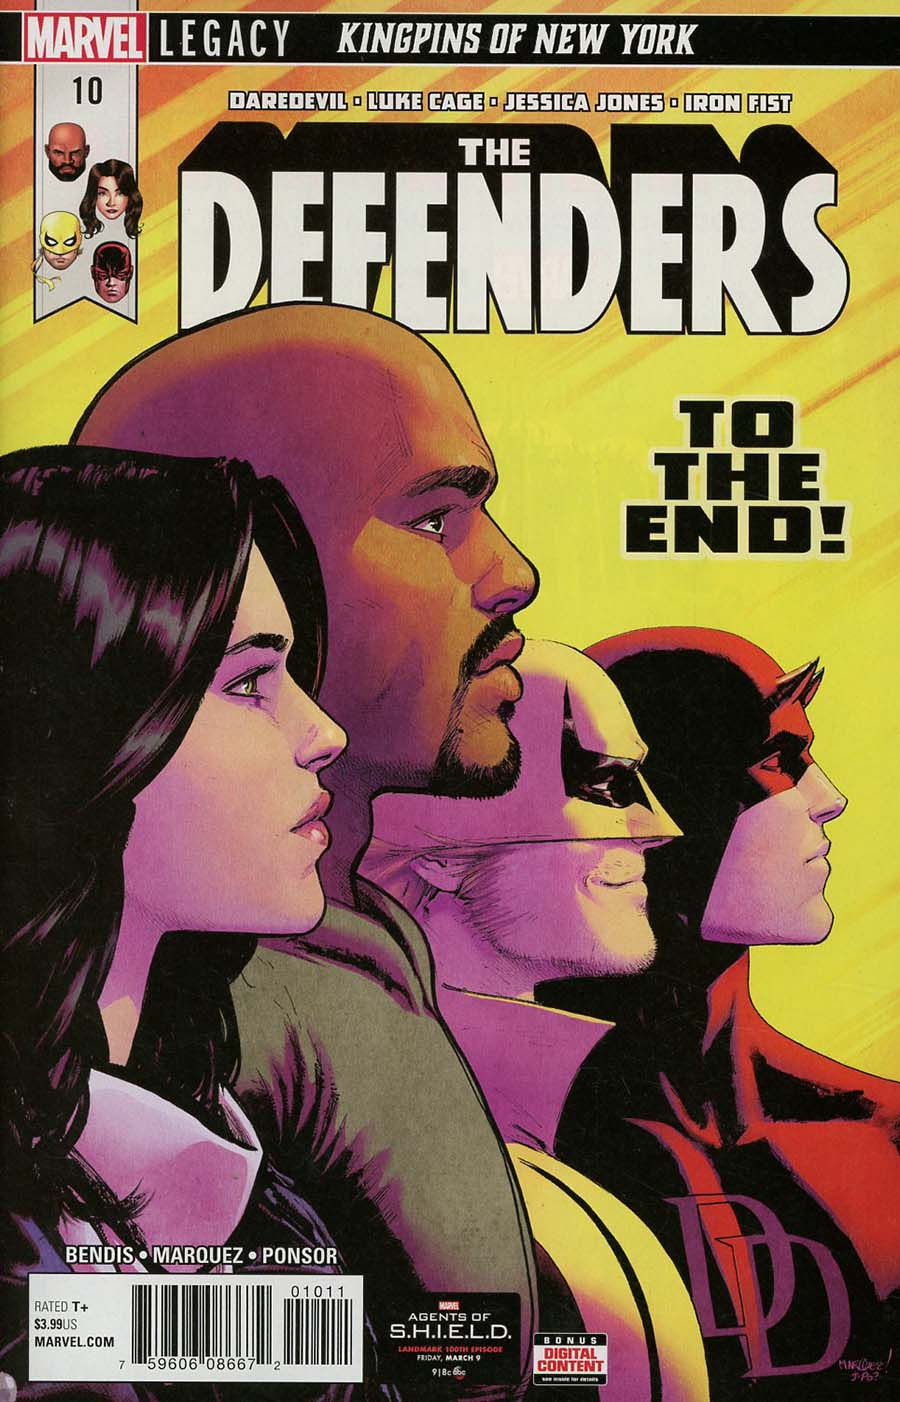 Defenders Vol 5 #10 Cover A Regular David Marquez Cover (Marvel Legacy Tie-In)